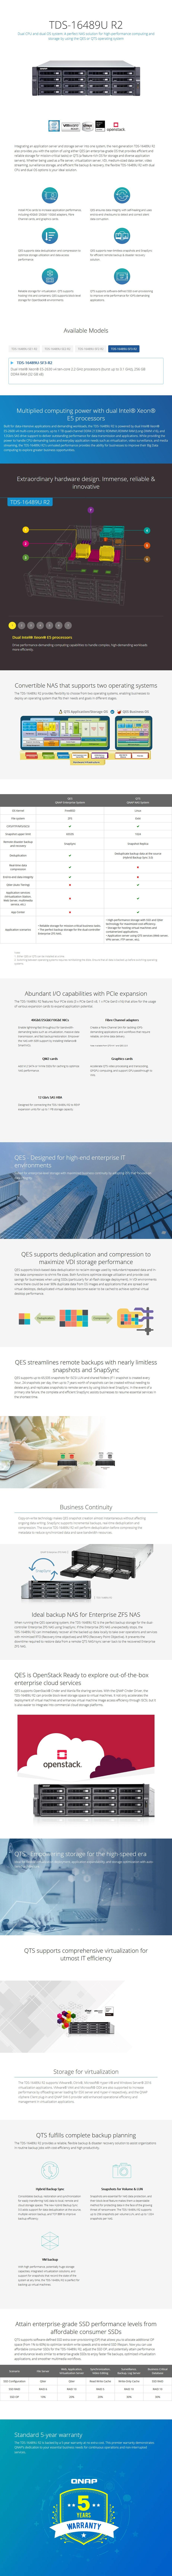 QNAP TDS-16489U-SF3-R2 16-Bay Diskless NAS Dual Xeon E5-2630 v4 256GB QES/QTS - Desktop Overview 1